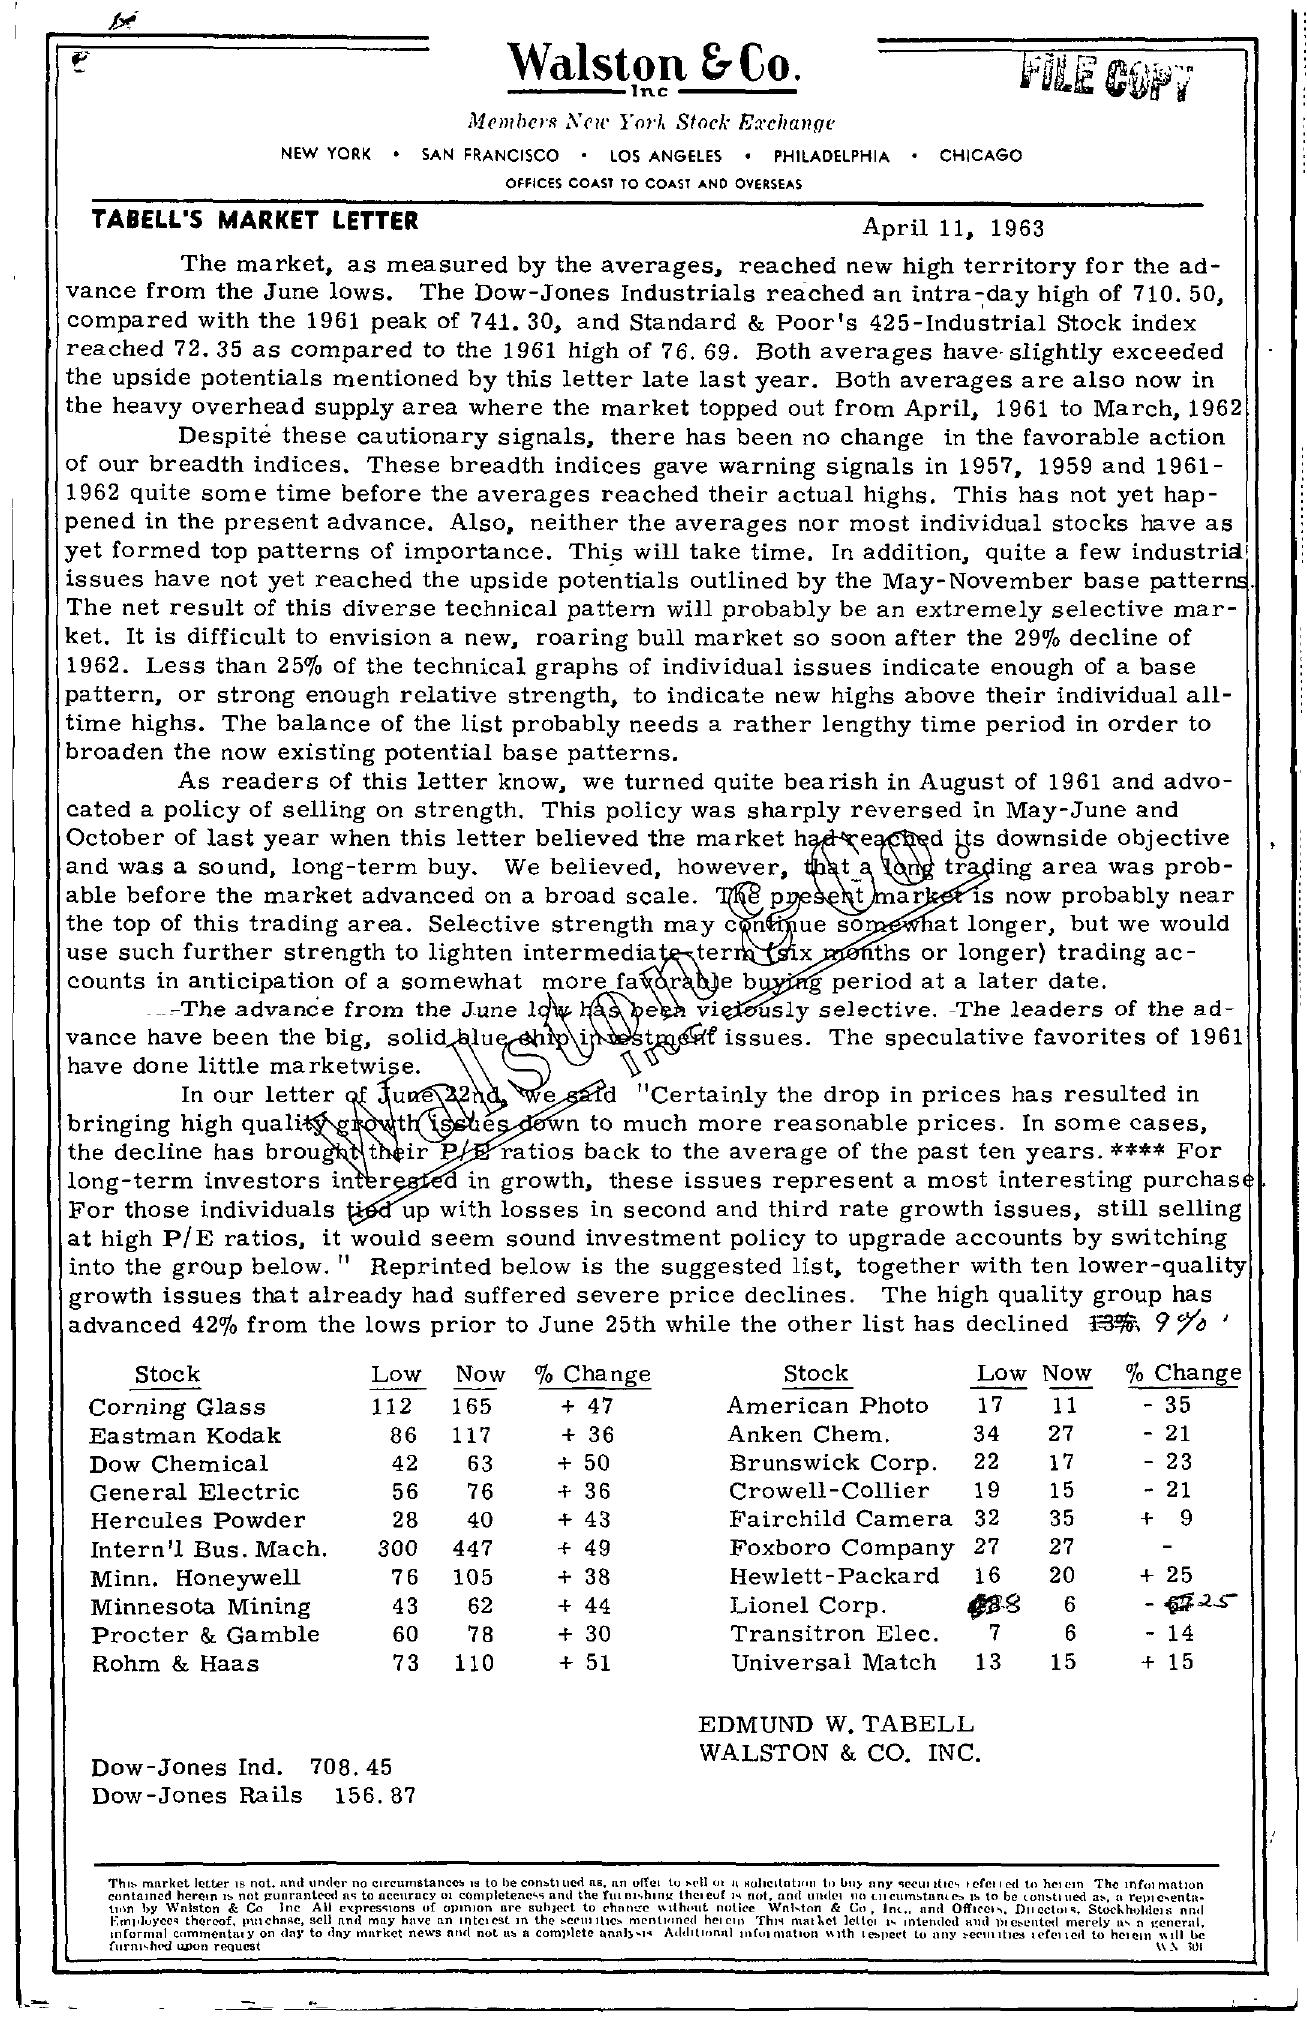 Tabell's Market Letter - April 11, 1963